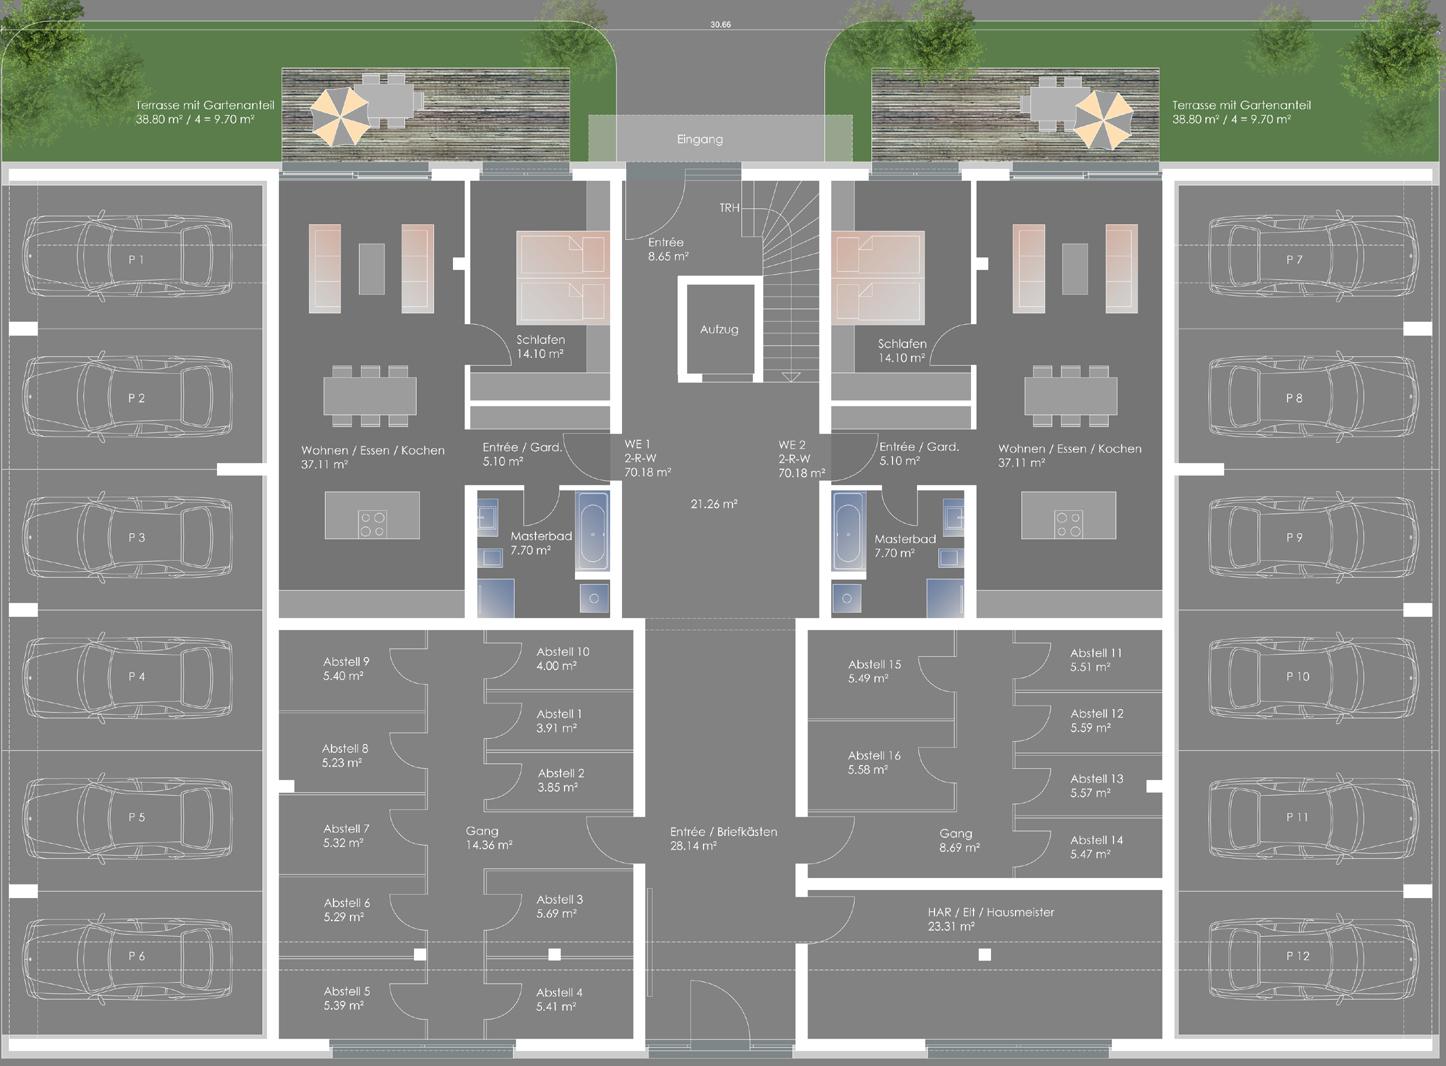 Neubau Mehrfamilienwohnhaus Kurt-Kresse-Strasse - Erdgeschoss